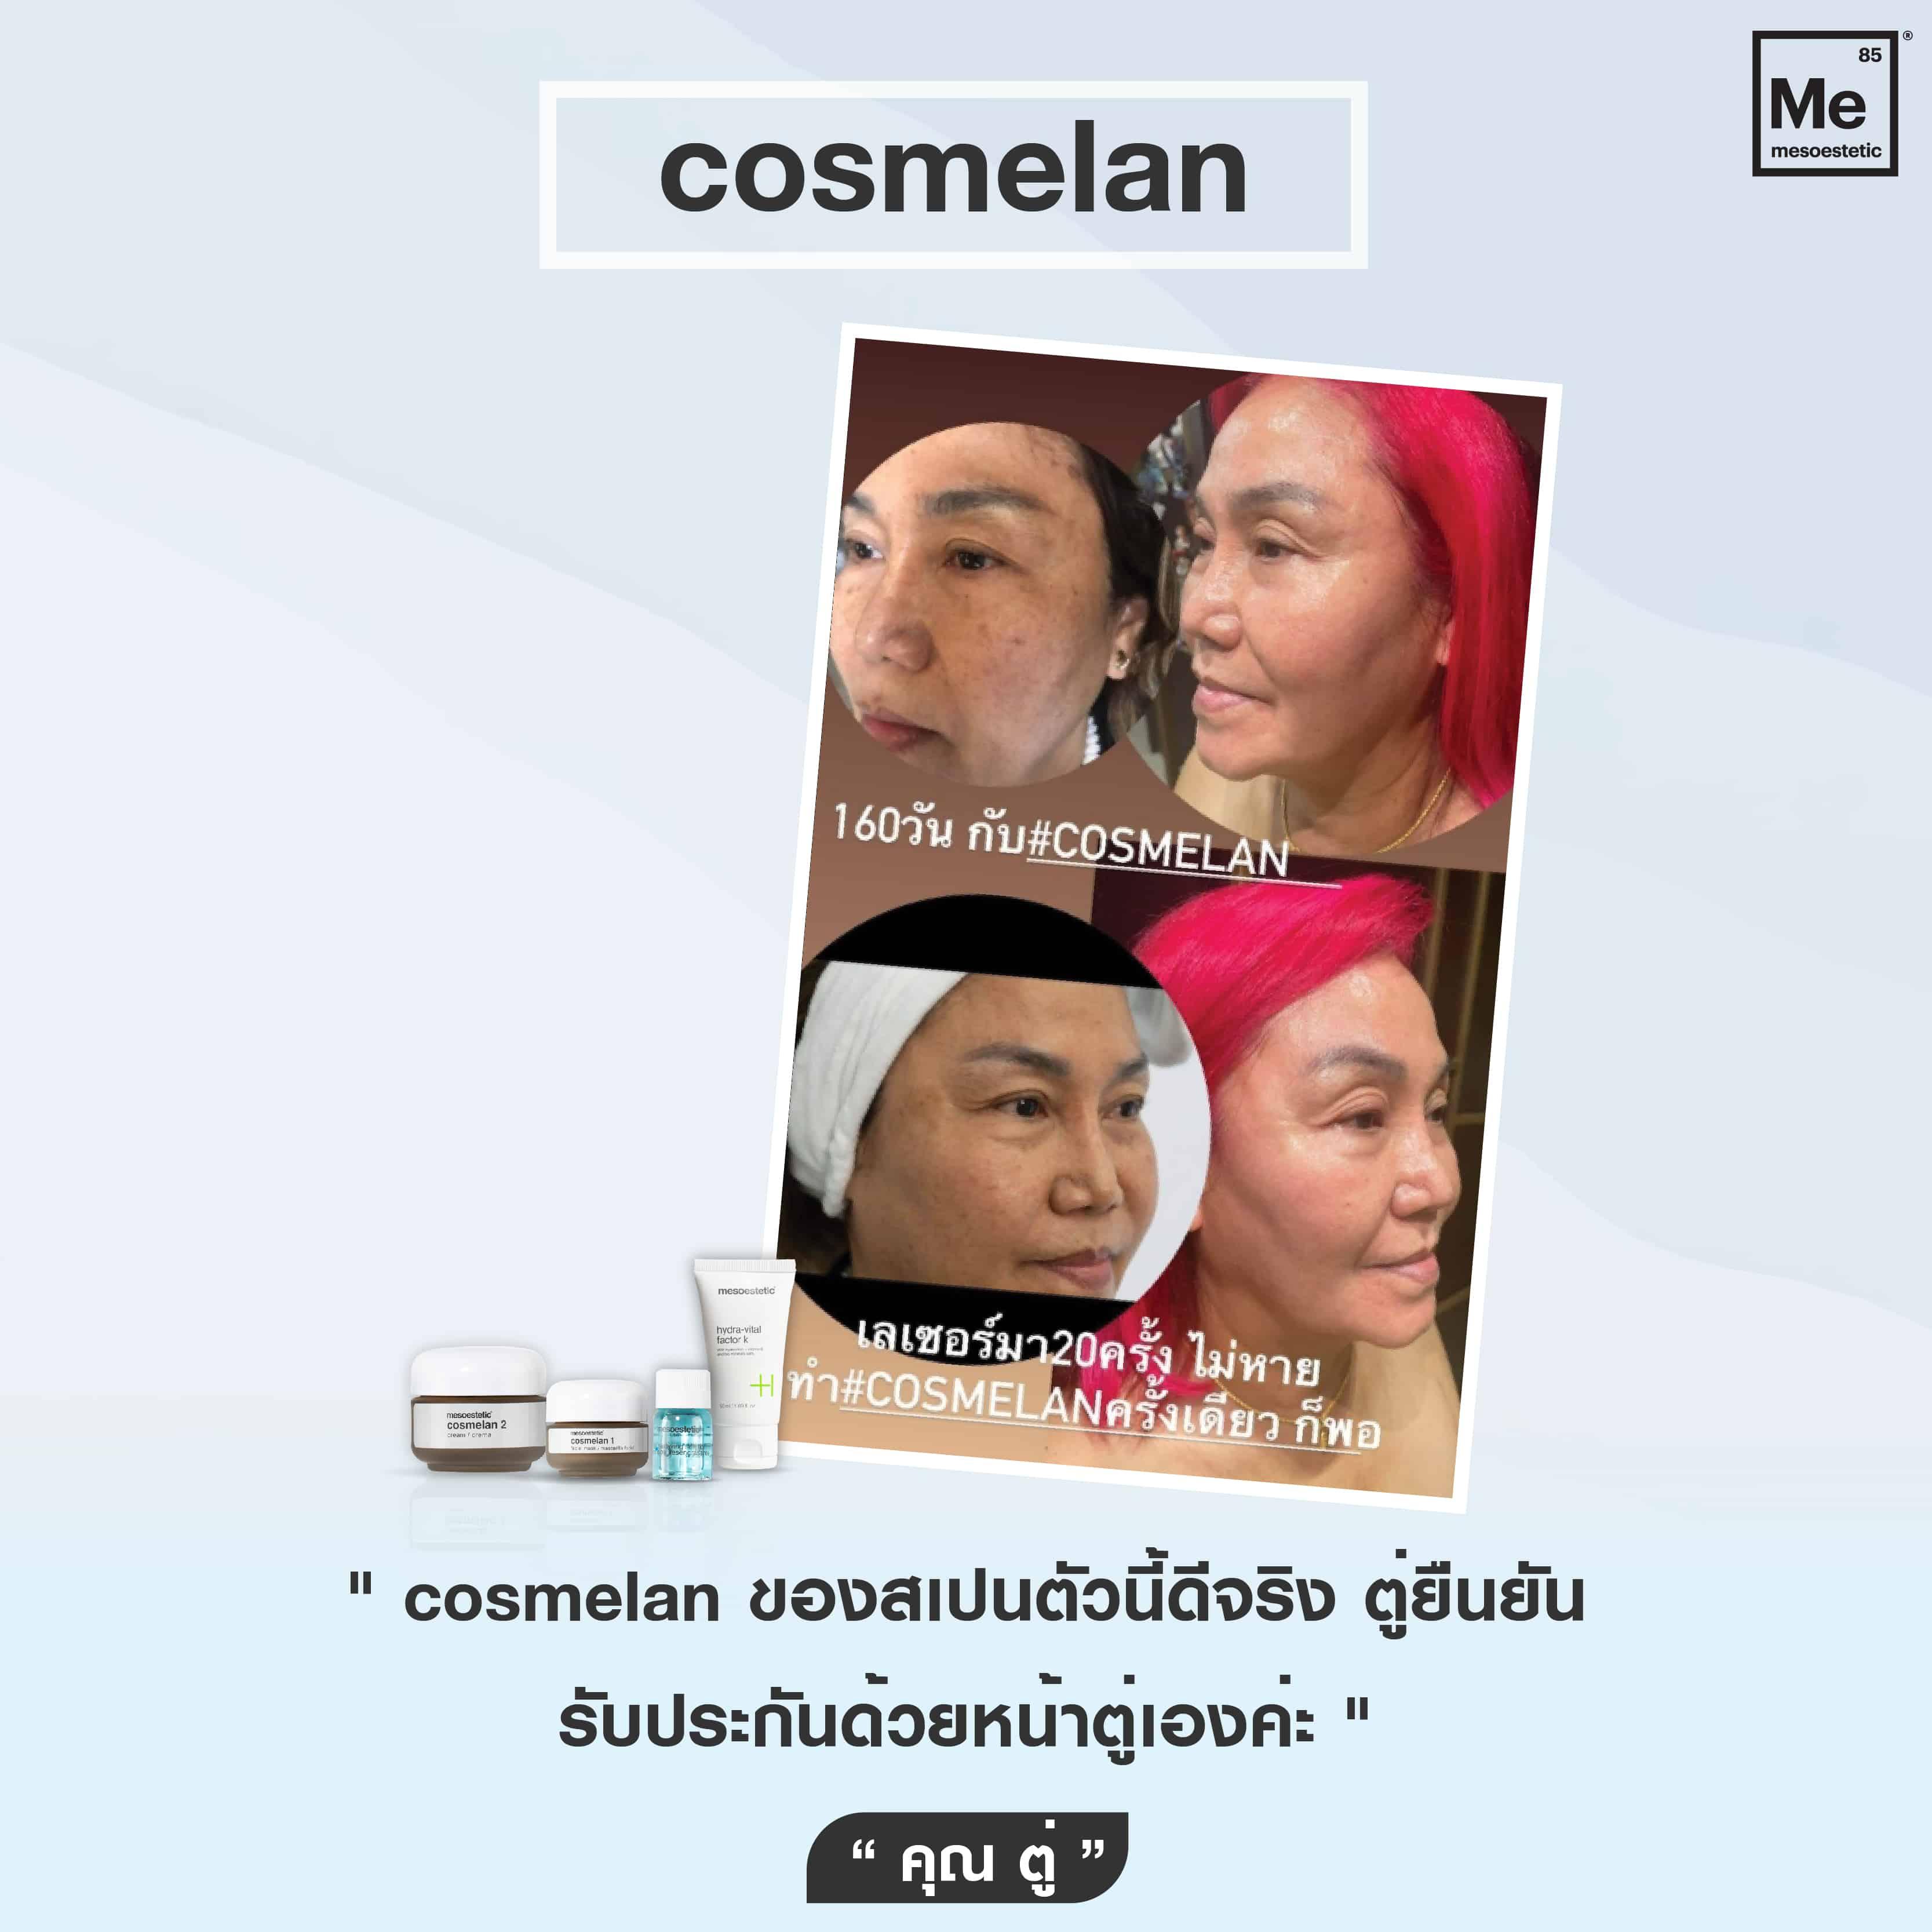 03 Review cosmelan-01